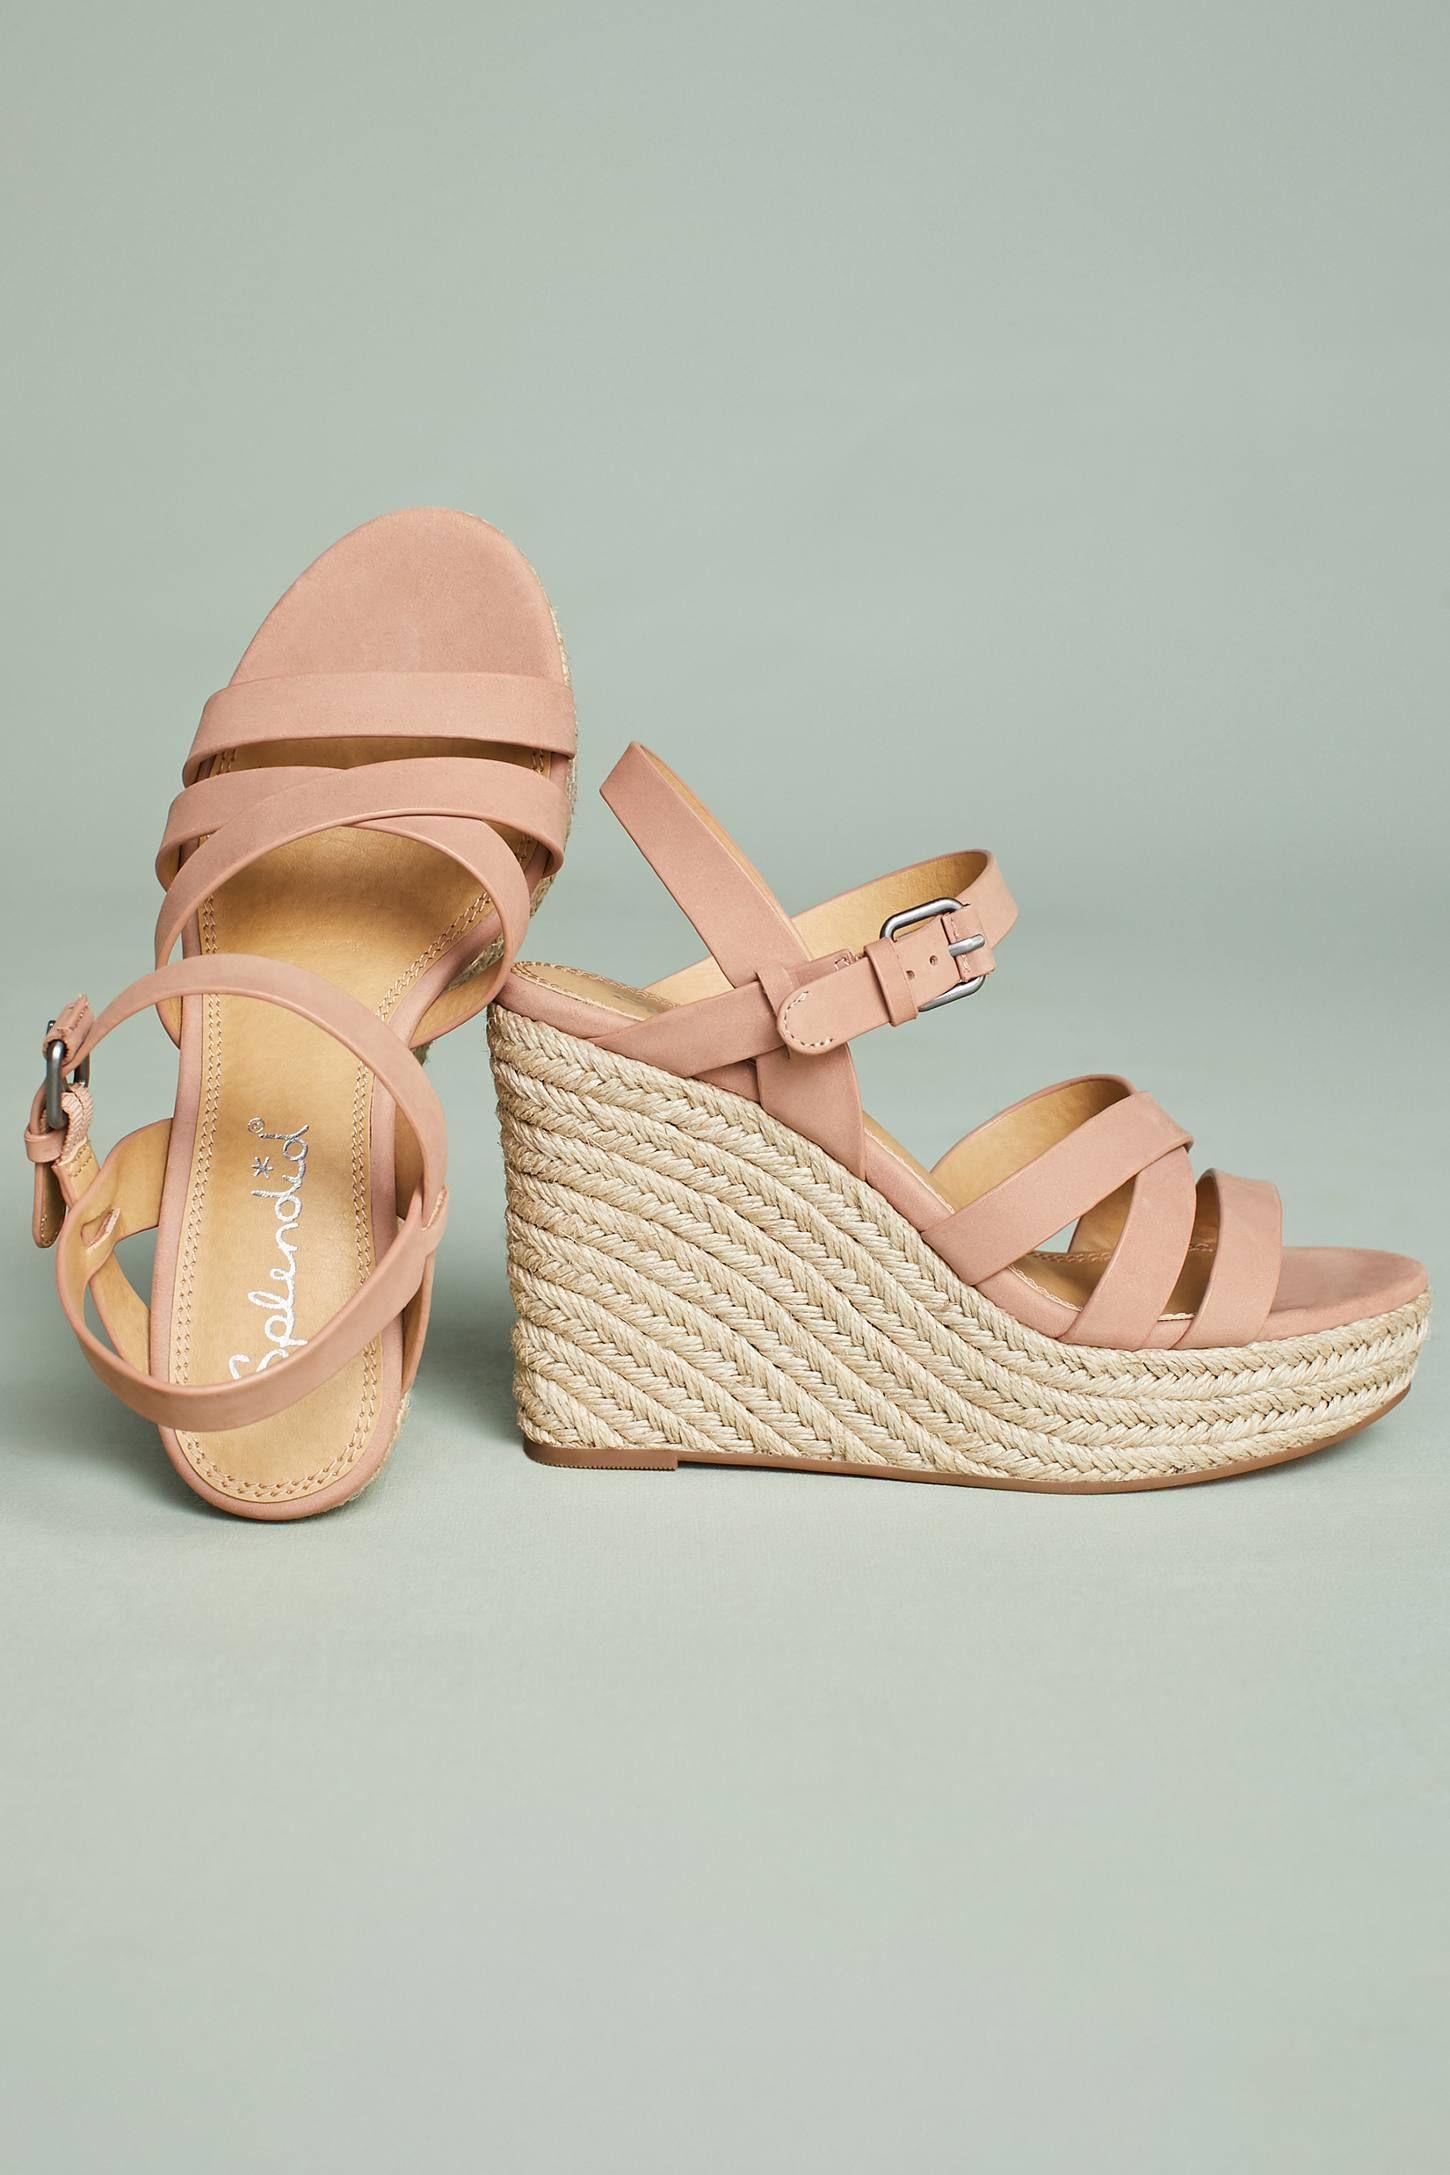 894d15bac16 Splendid Billie Espadrille Wedge Sandals | ˗ˏˋ g i m m e ˊˎ ...